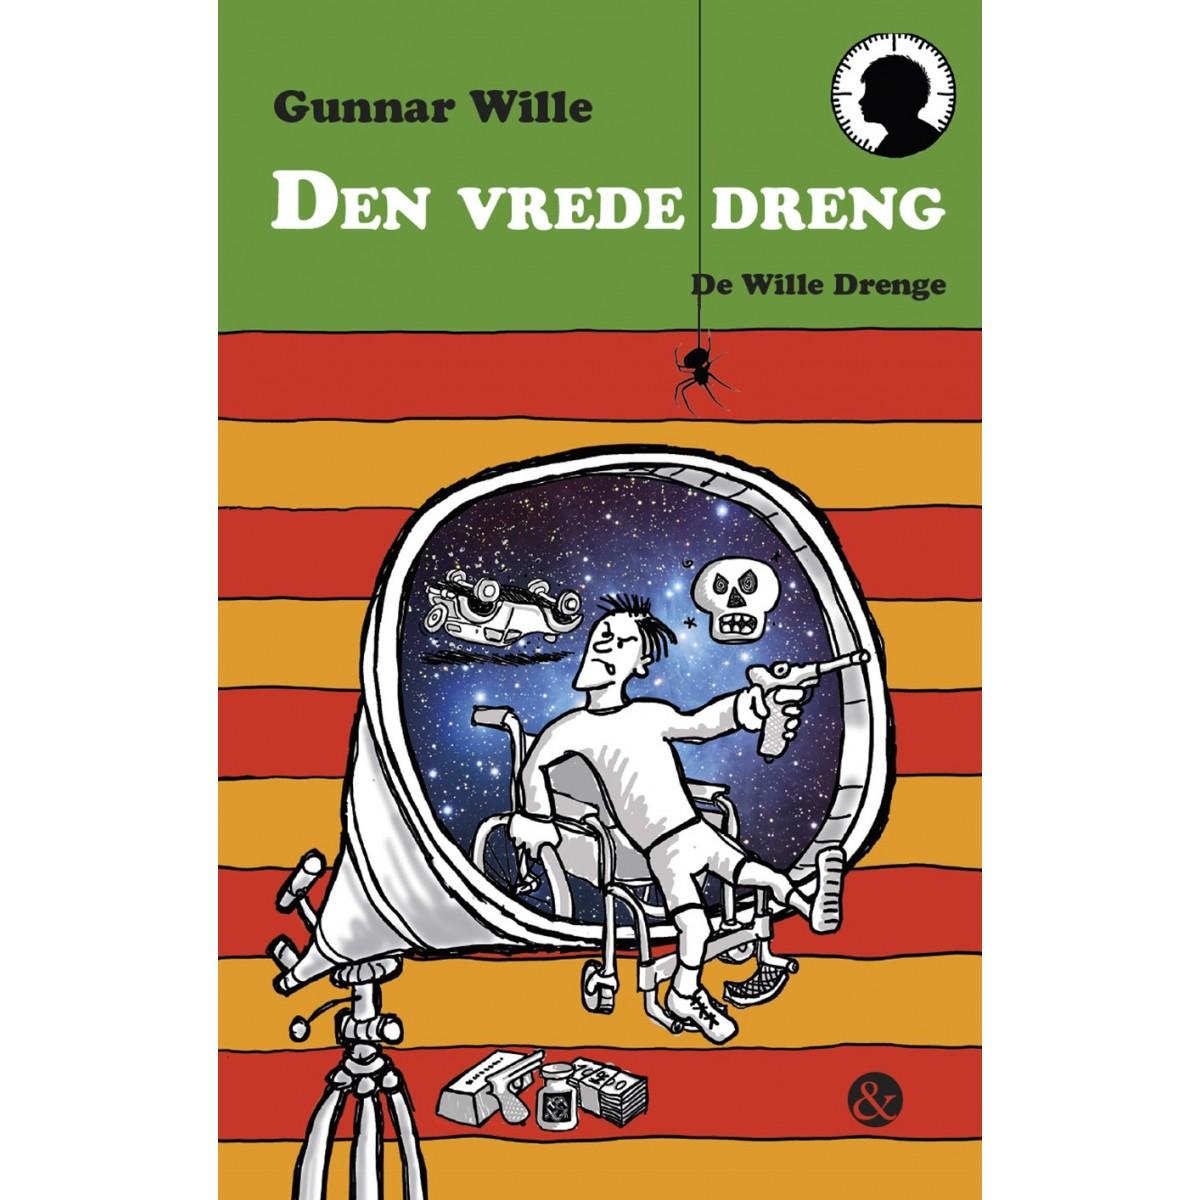 Gunnar Wille: Den vrede dreng